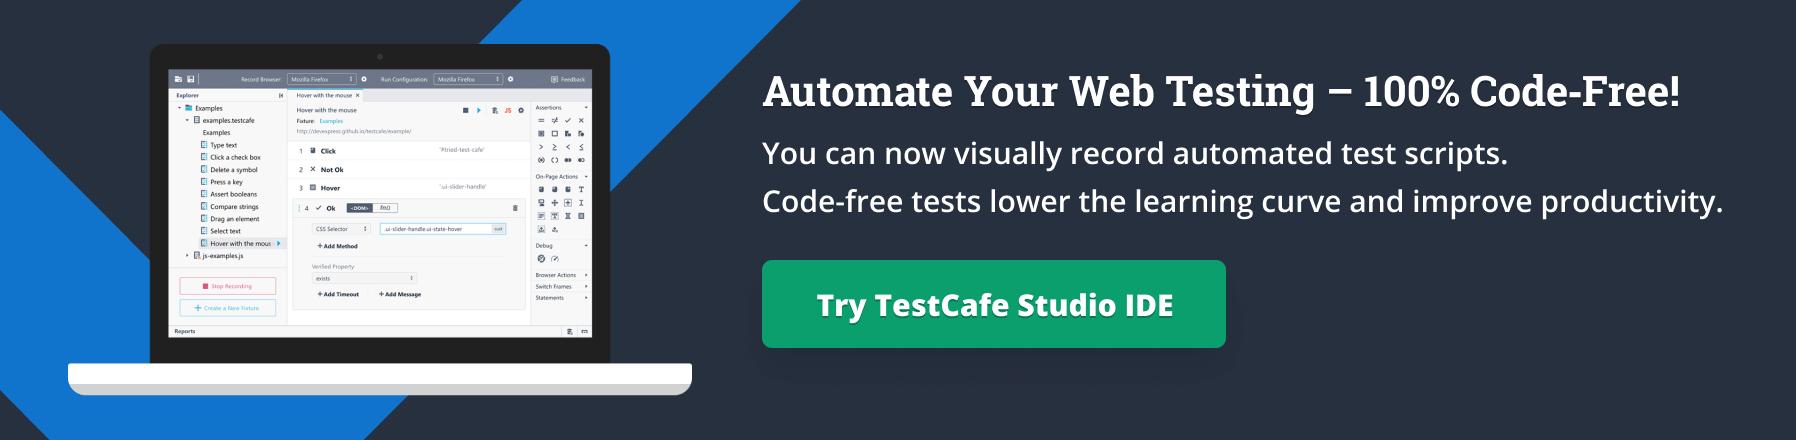 Try TestCafe Studio IDE